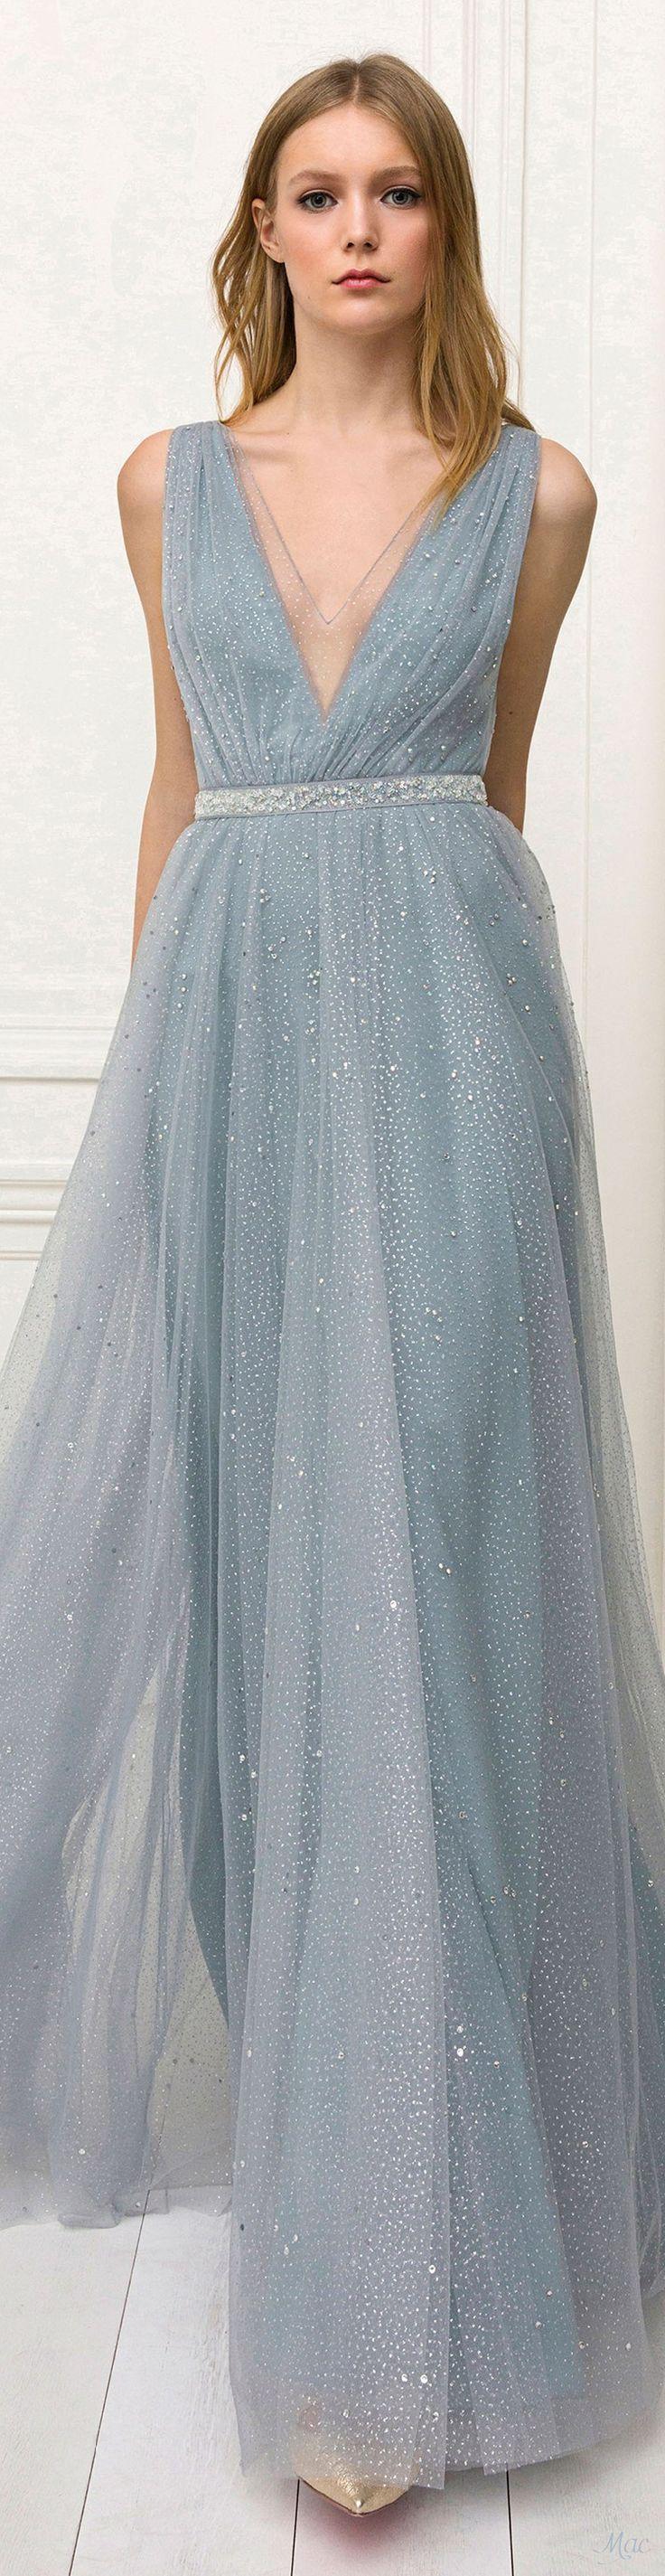 373 best JENNY PACKHAM BRIDE images on Pinterest | Wedding frocks ...